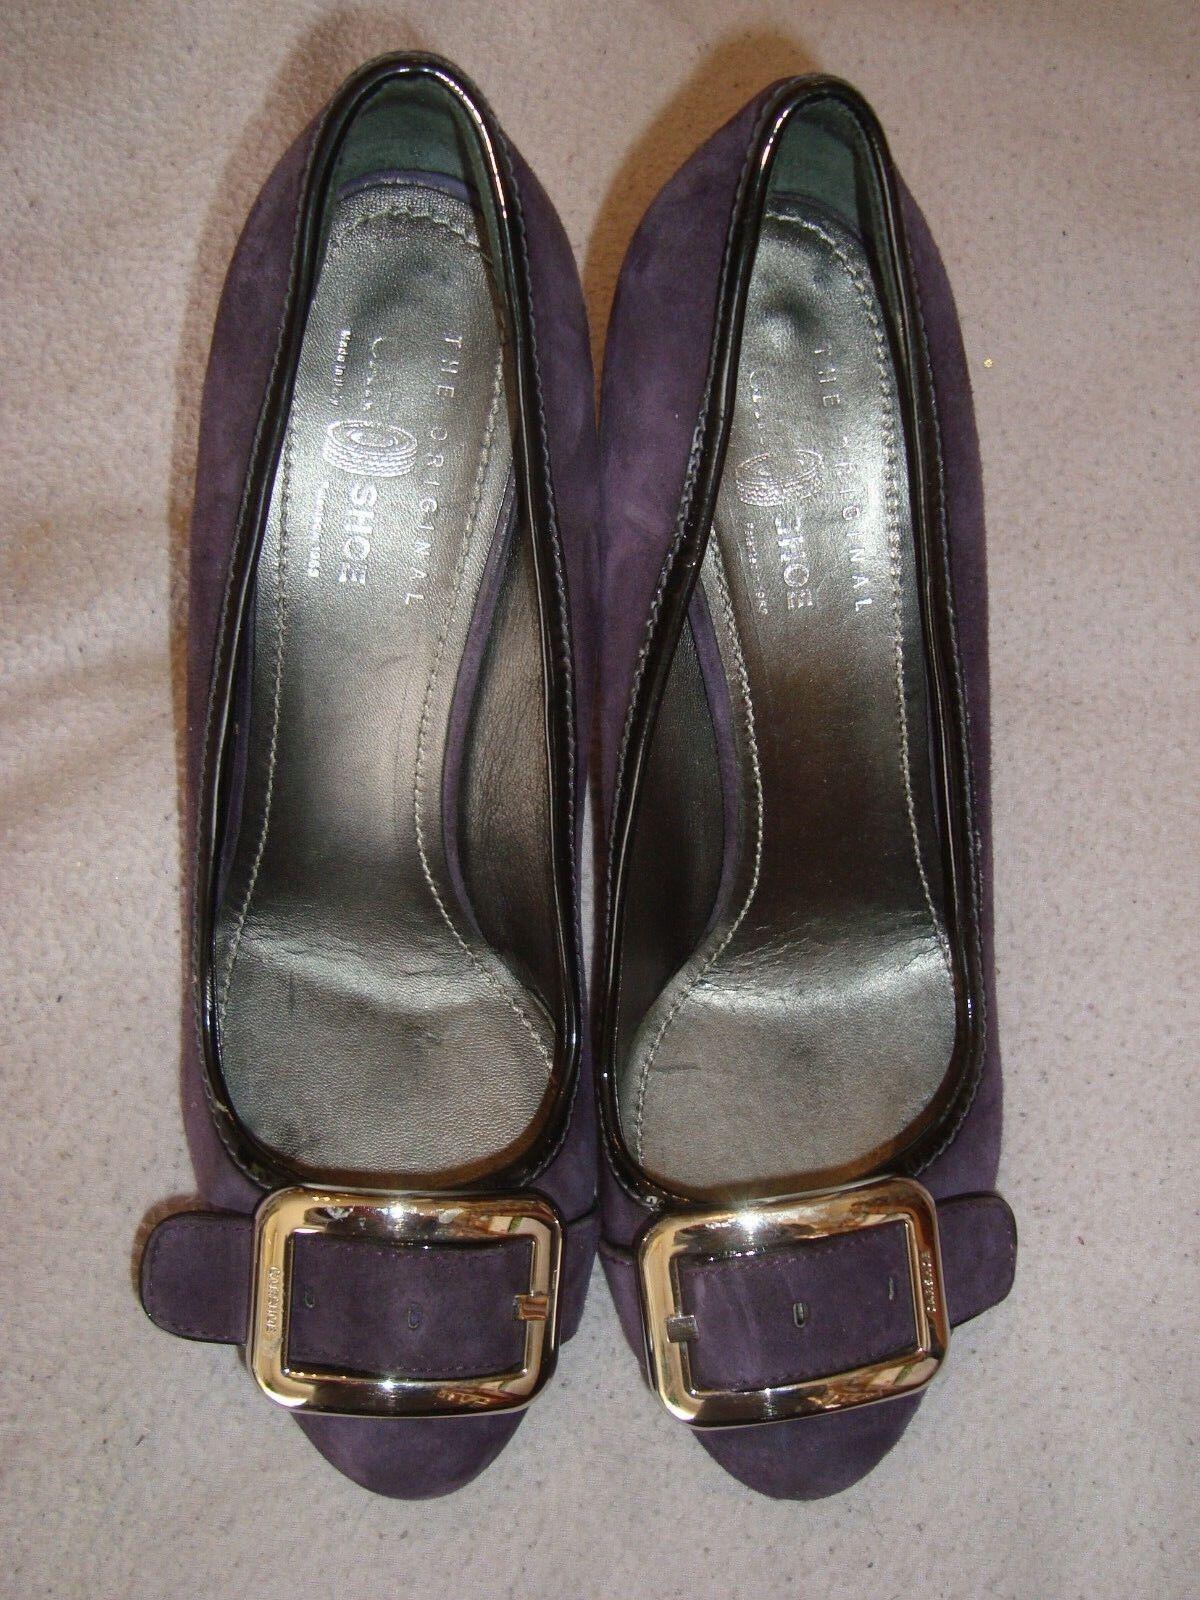 CAR chaussures by PRADA UK 7 EU 40 violet  Suede   noir patent leather